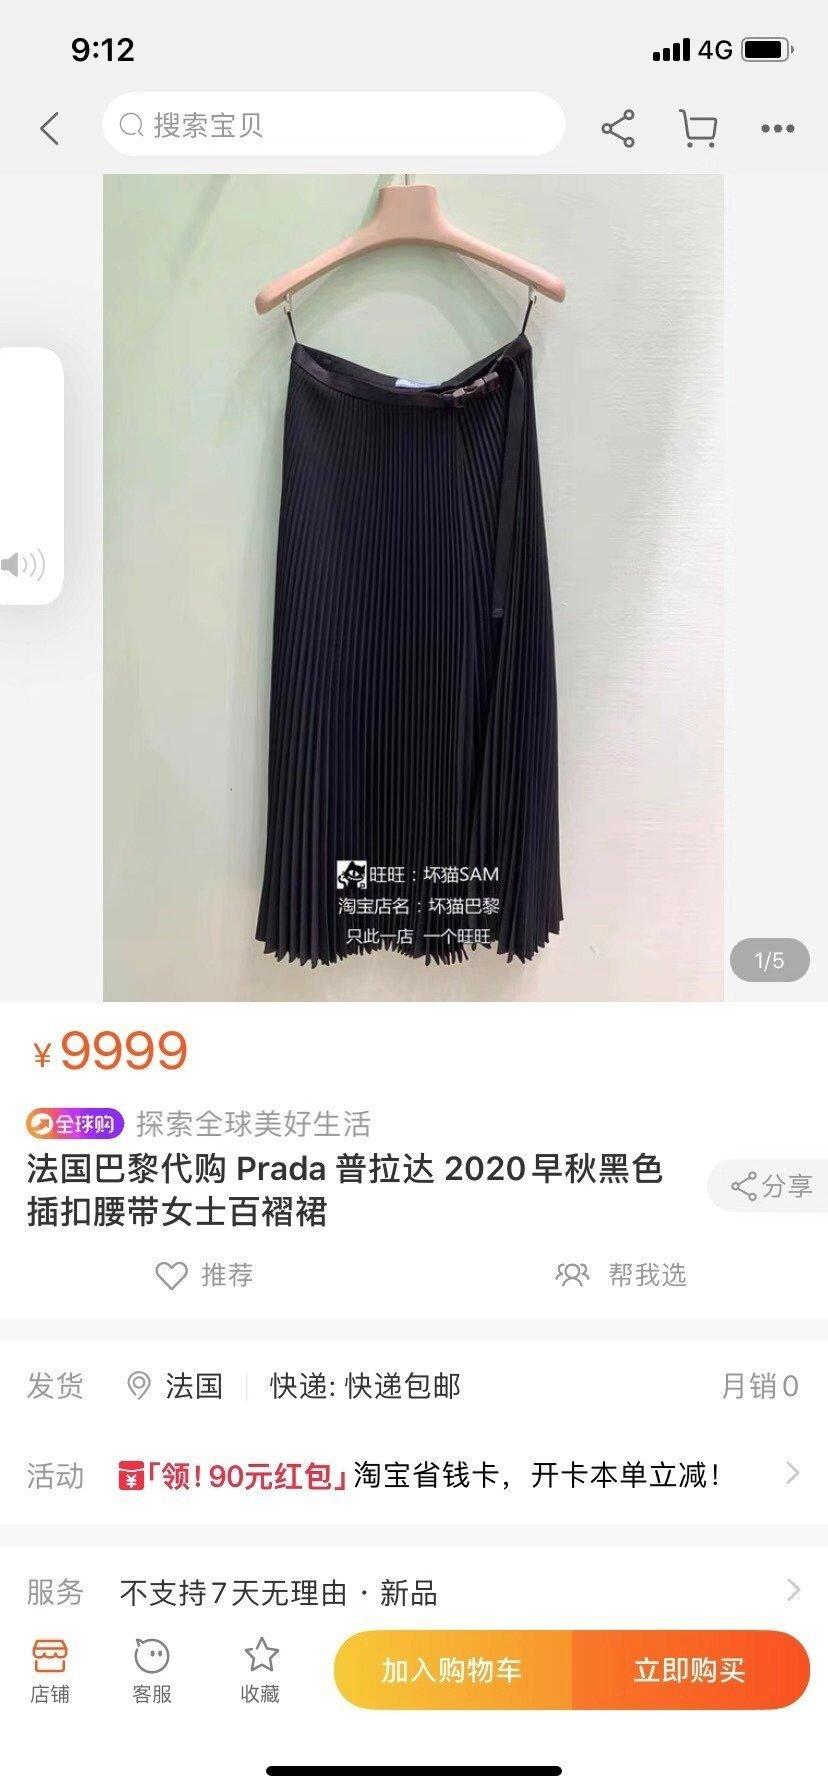 Designer skirt skirt irregular dresses summer new wholesale favourite classic simpleQLGG